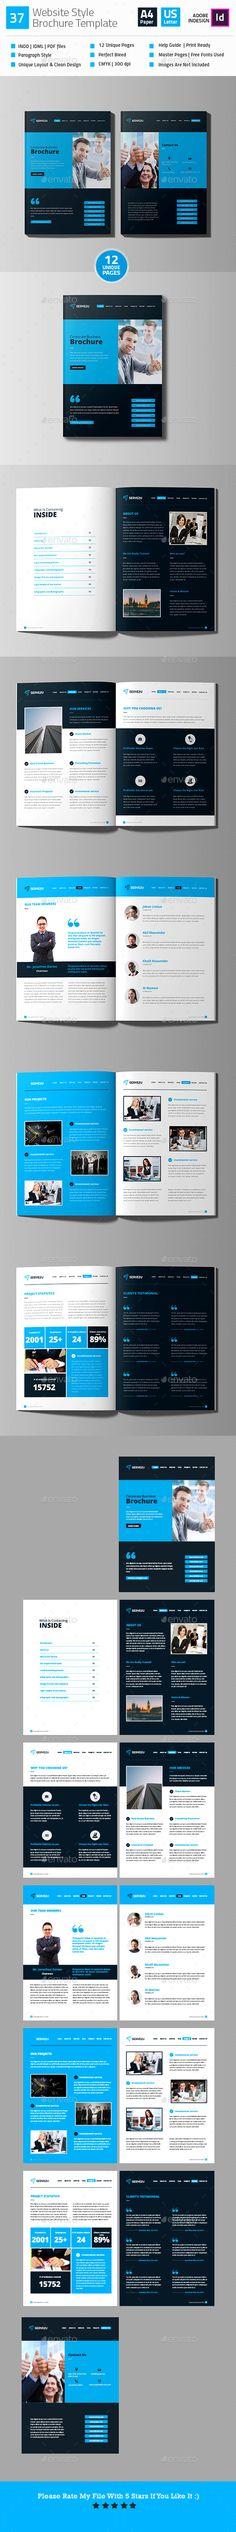 Construction Bi-Fold Brochure Template Corporate brochure design - technology brochure template